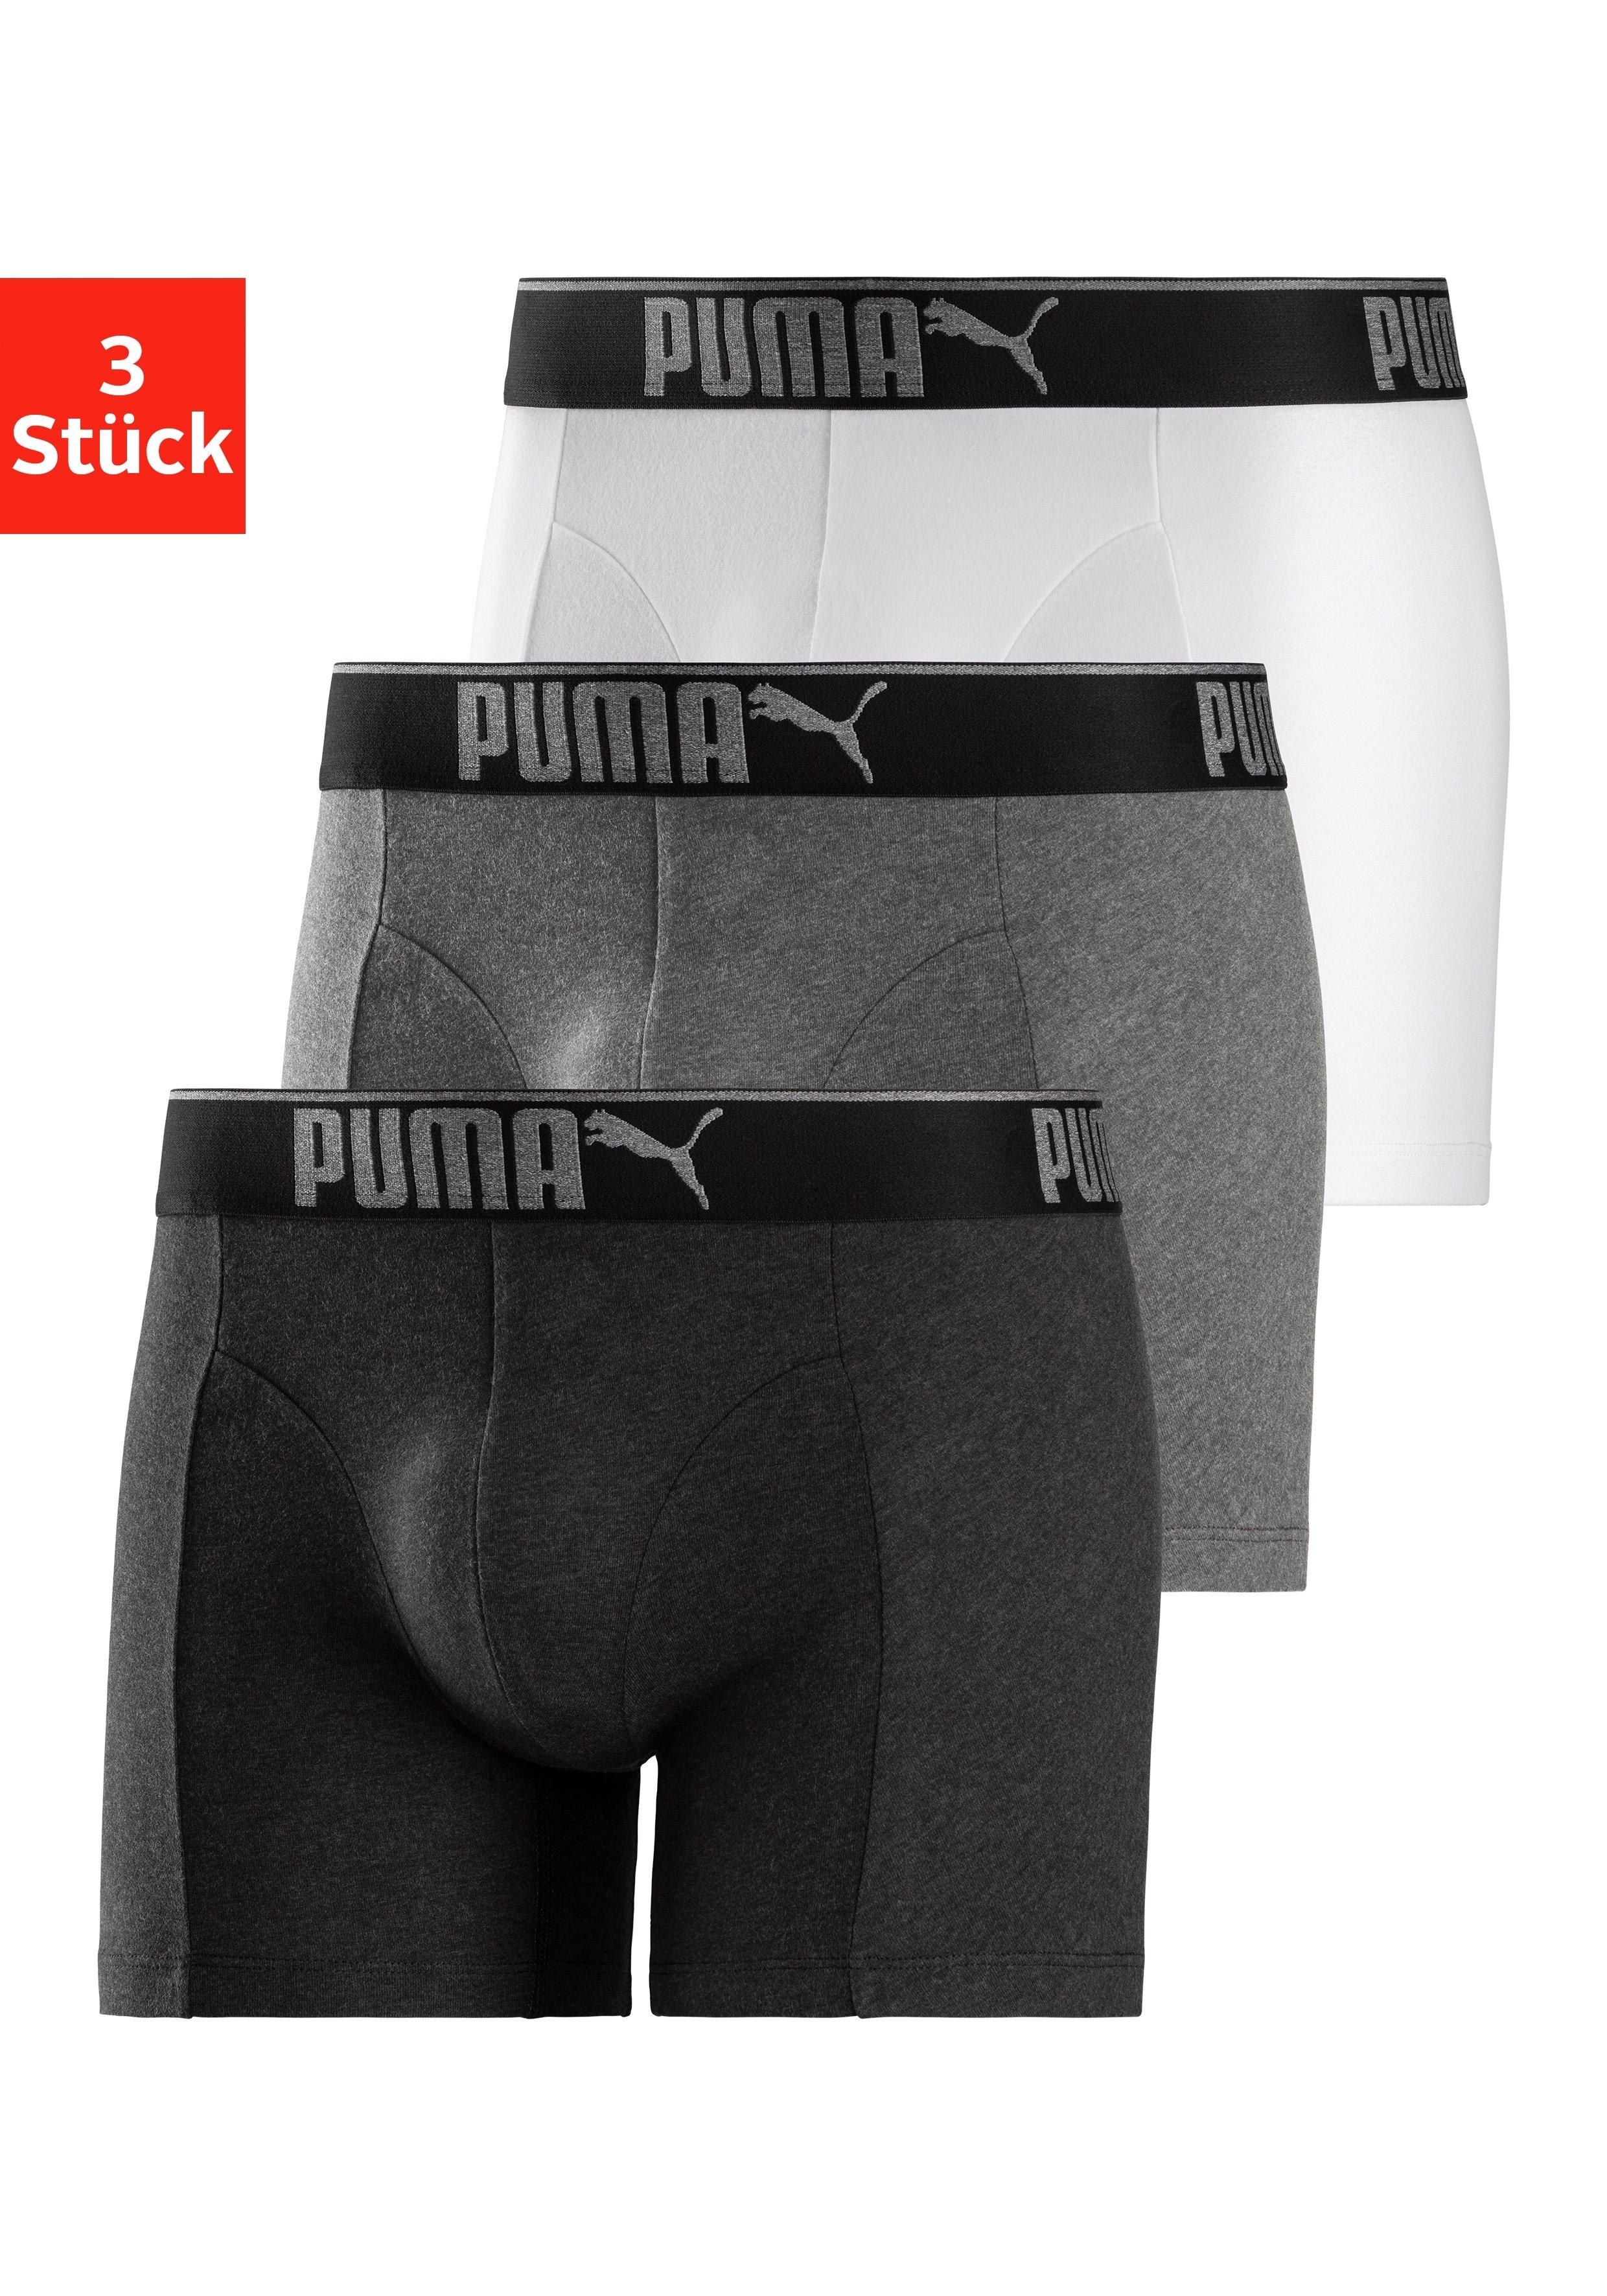 PUMA boxershort Premium-serie (3 stuks) - verschillende betaalmethodes